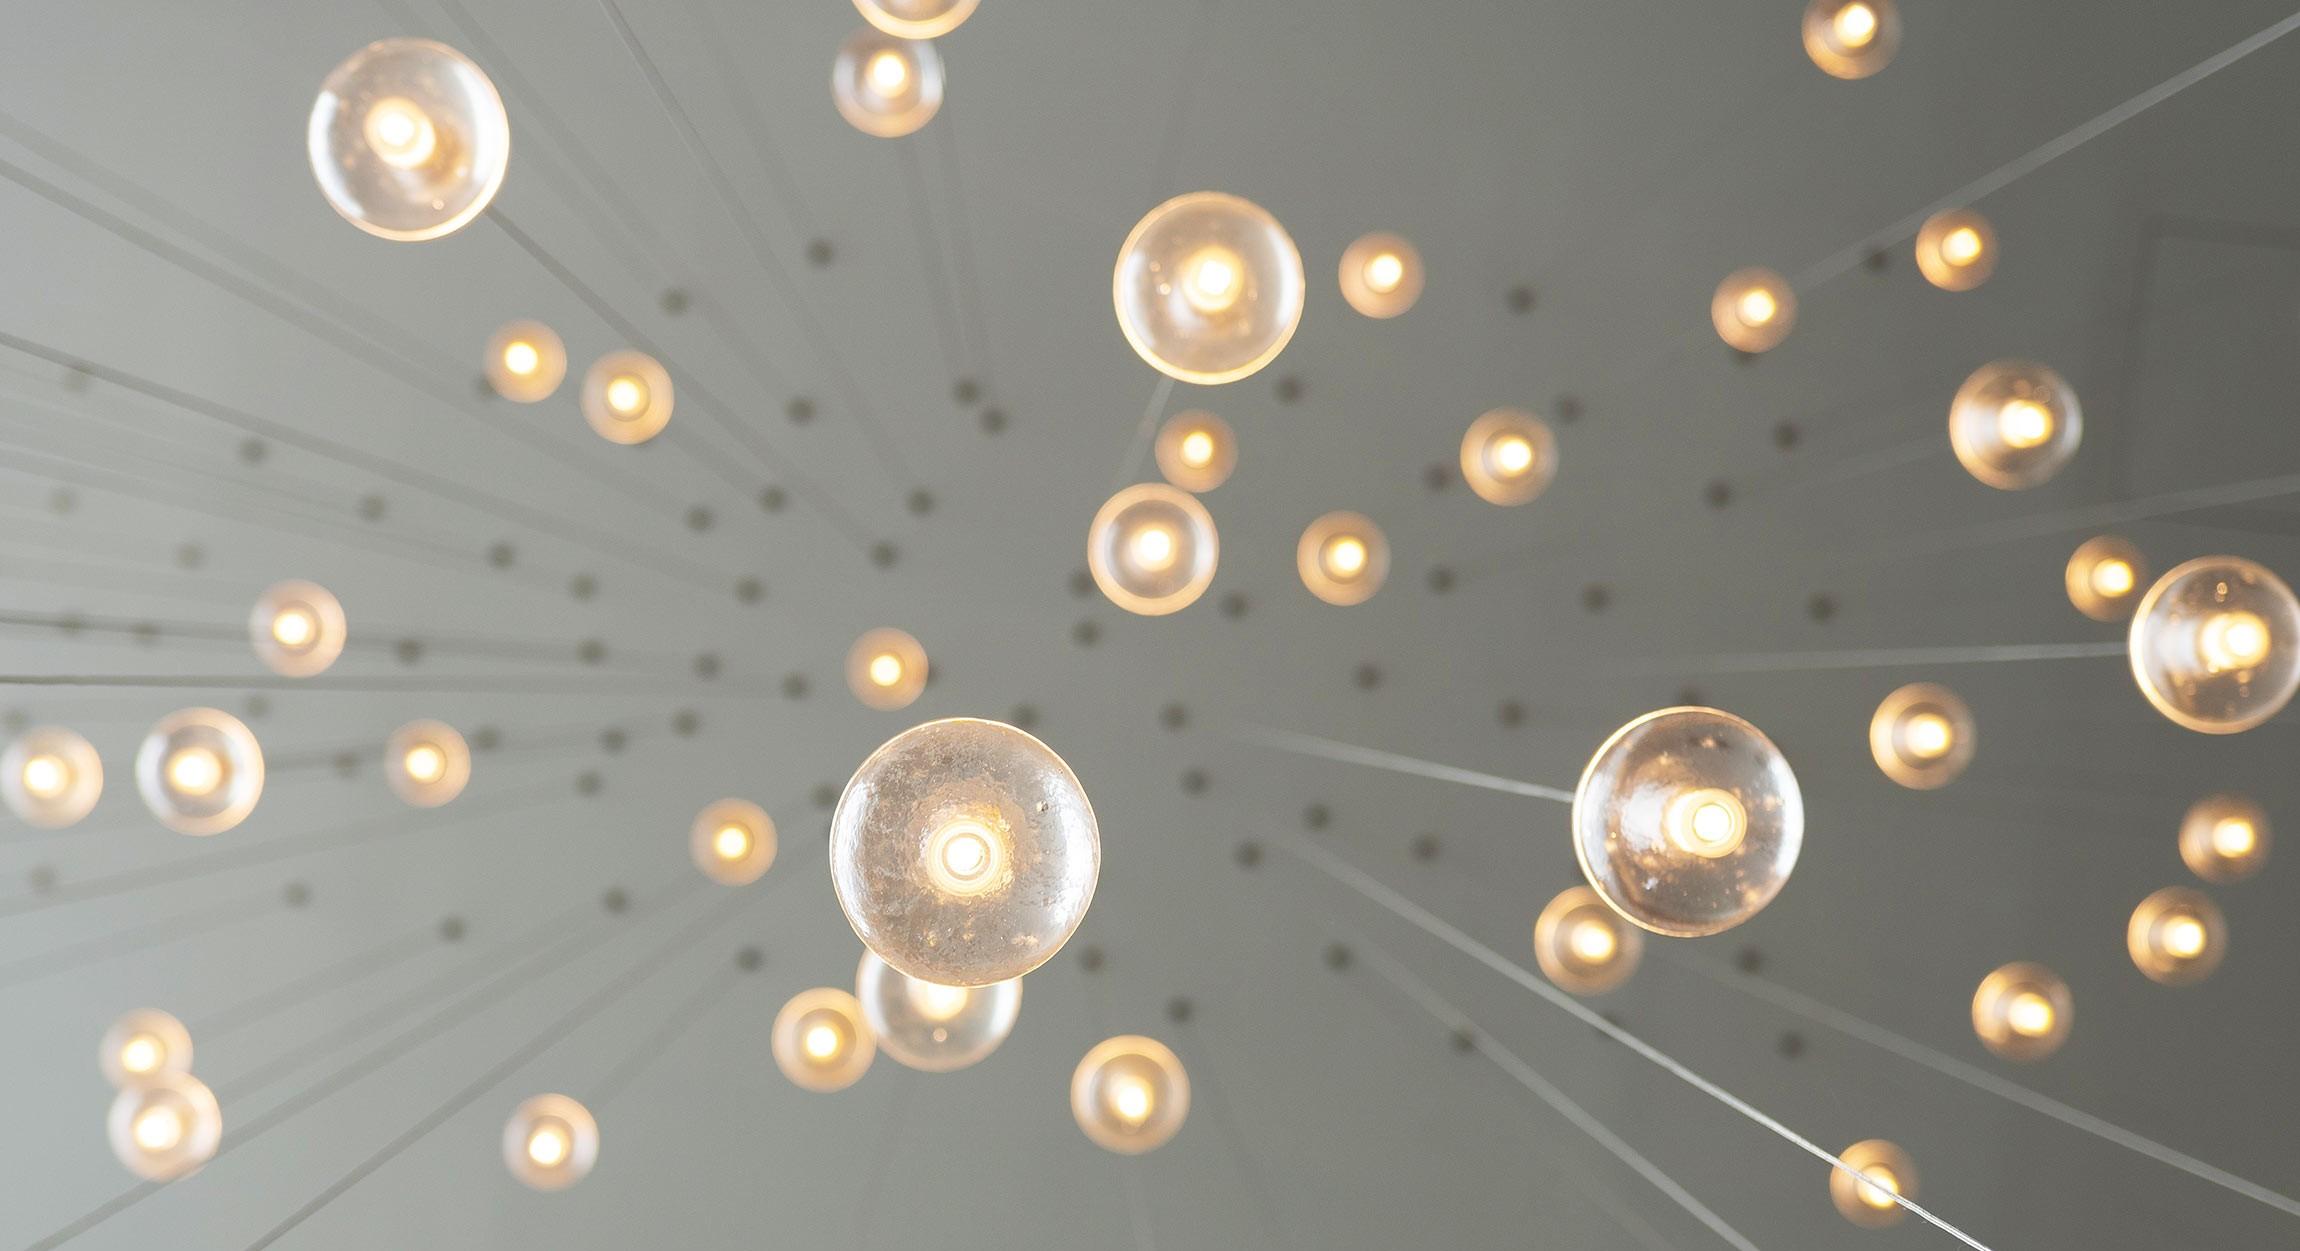 Lampen (Symbolbild)